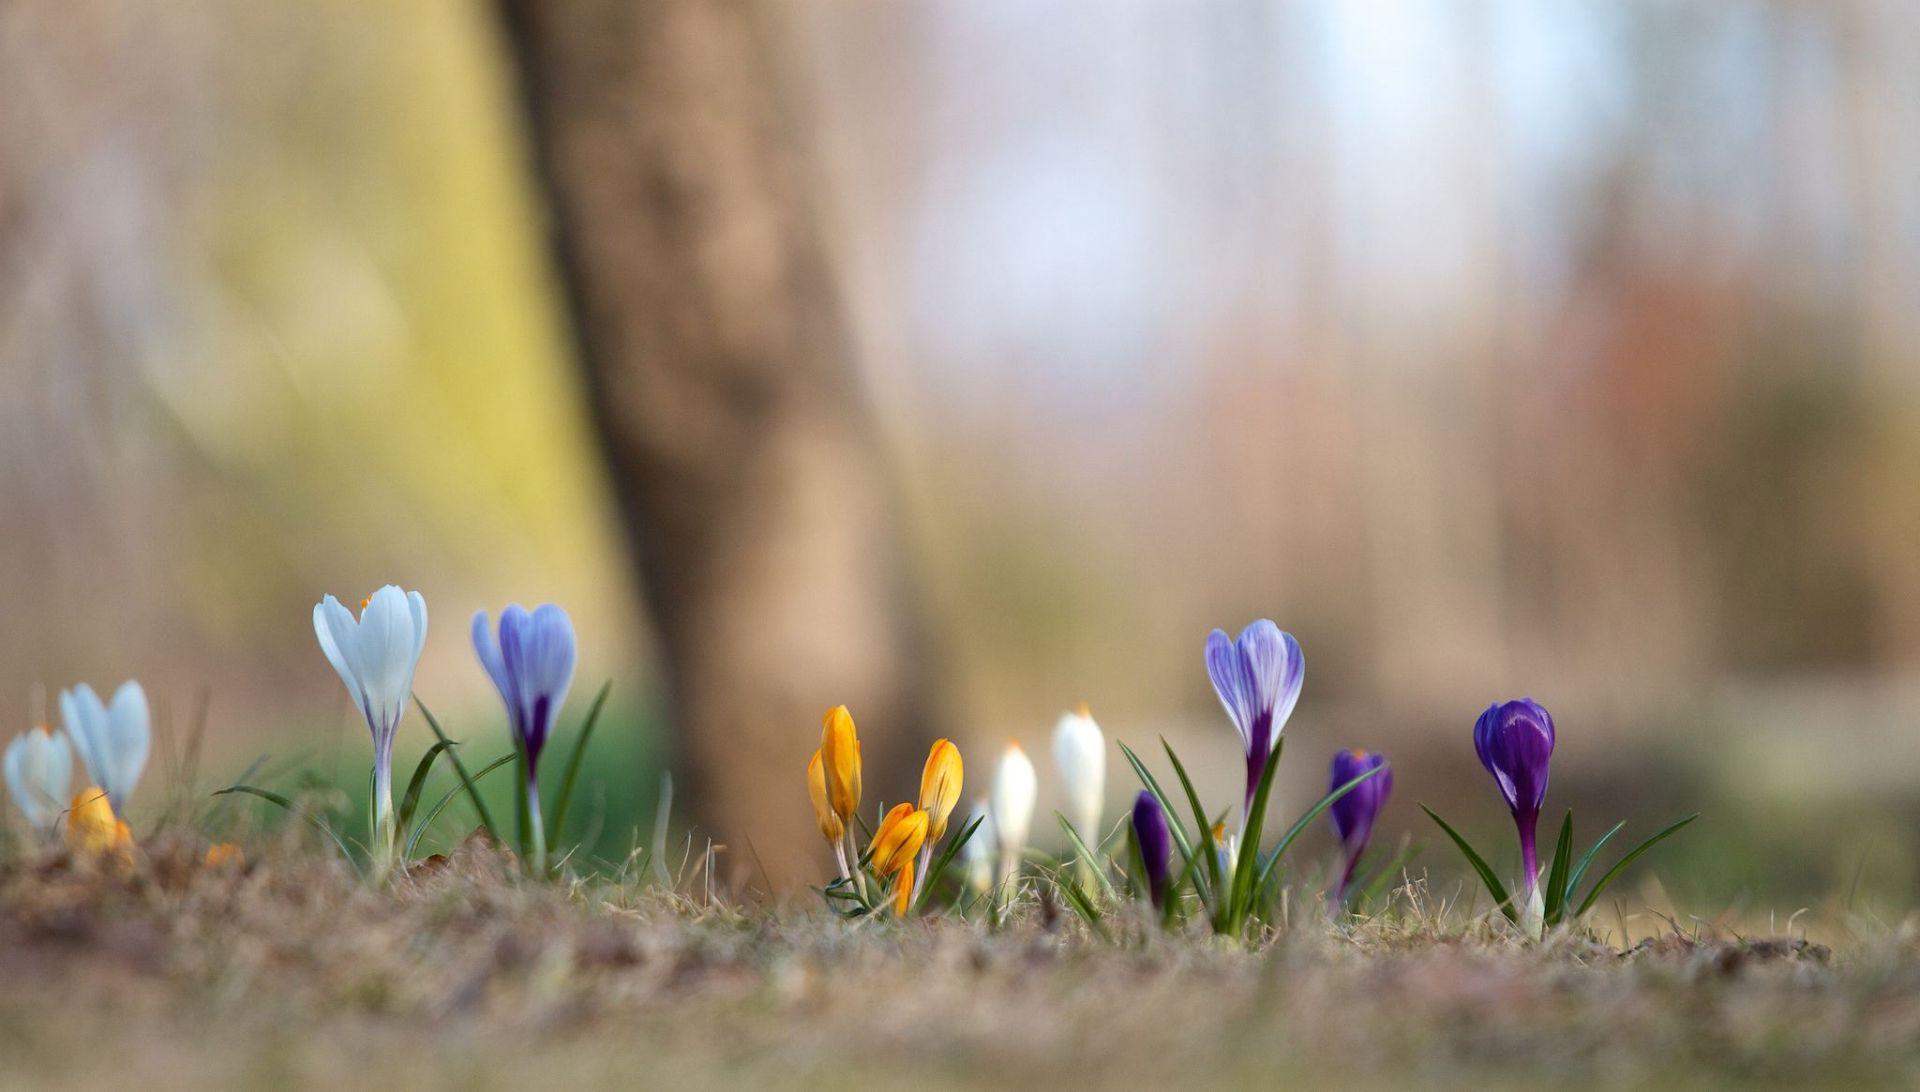 Original Spring Images